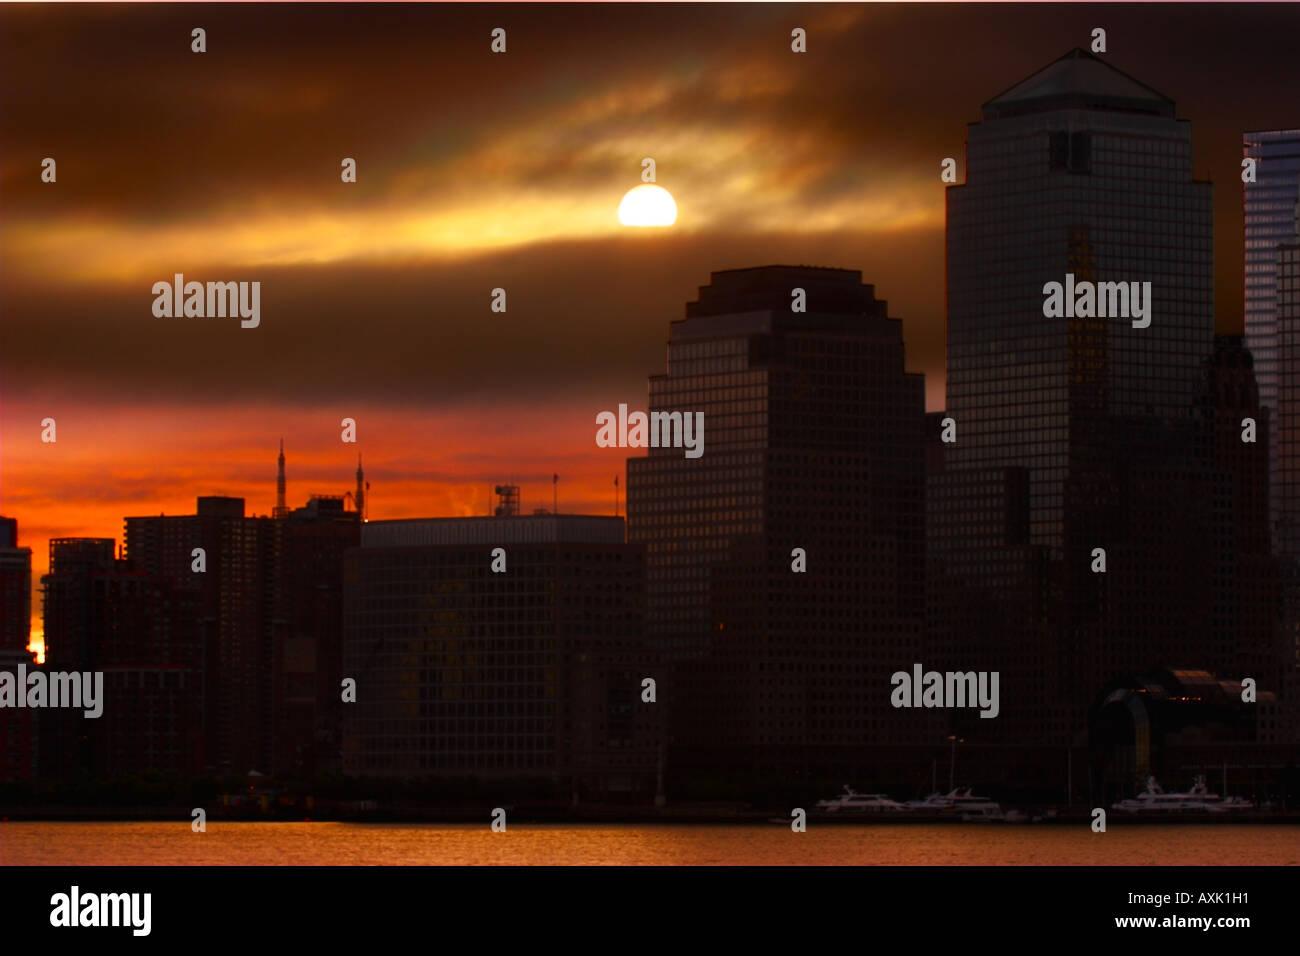 urban city sky clouds sun dusk sunset sunrise evening morning orange black shadow end water boats building city - Stock Image